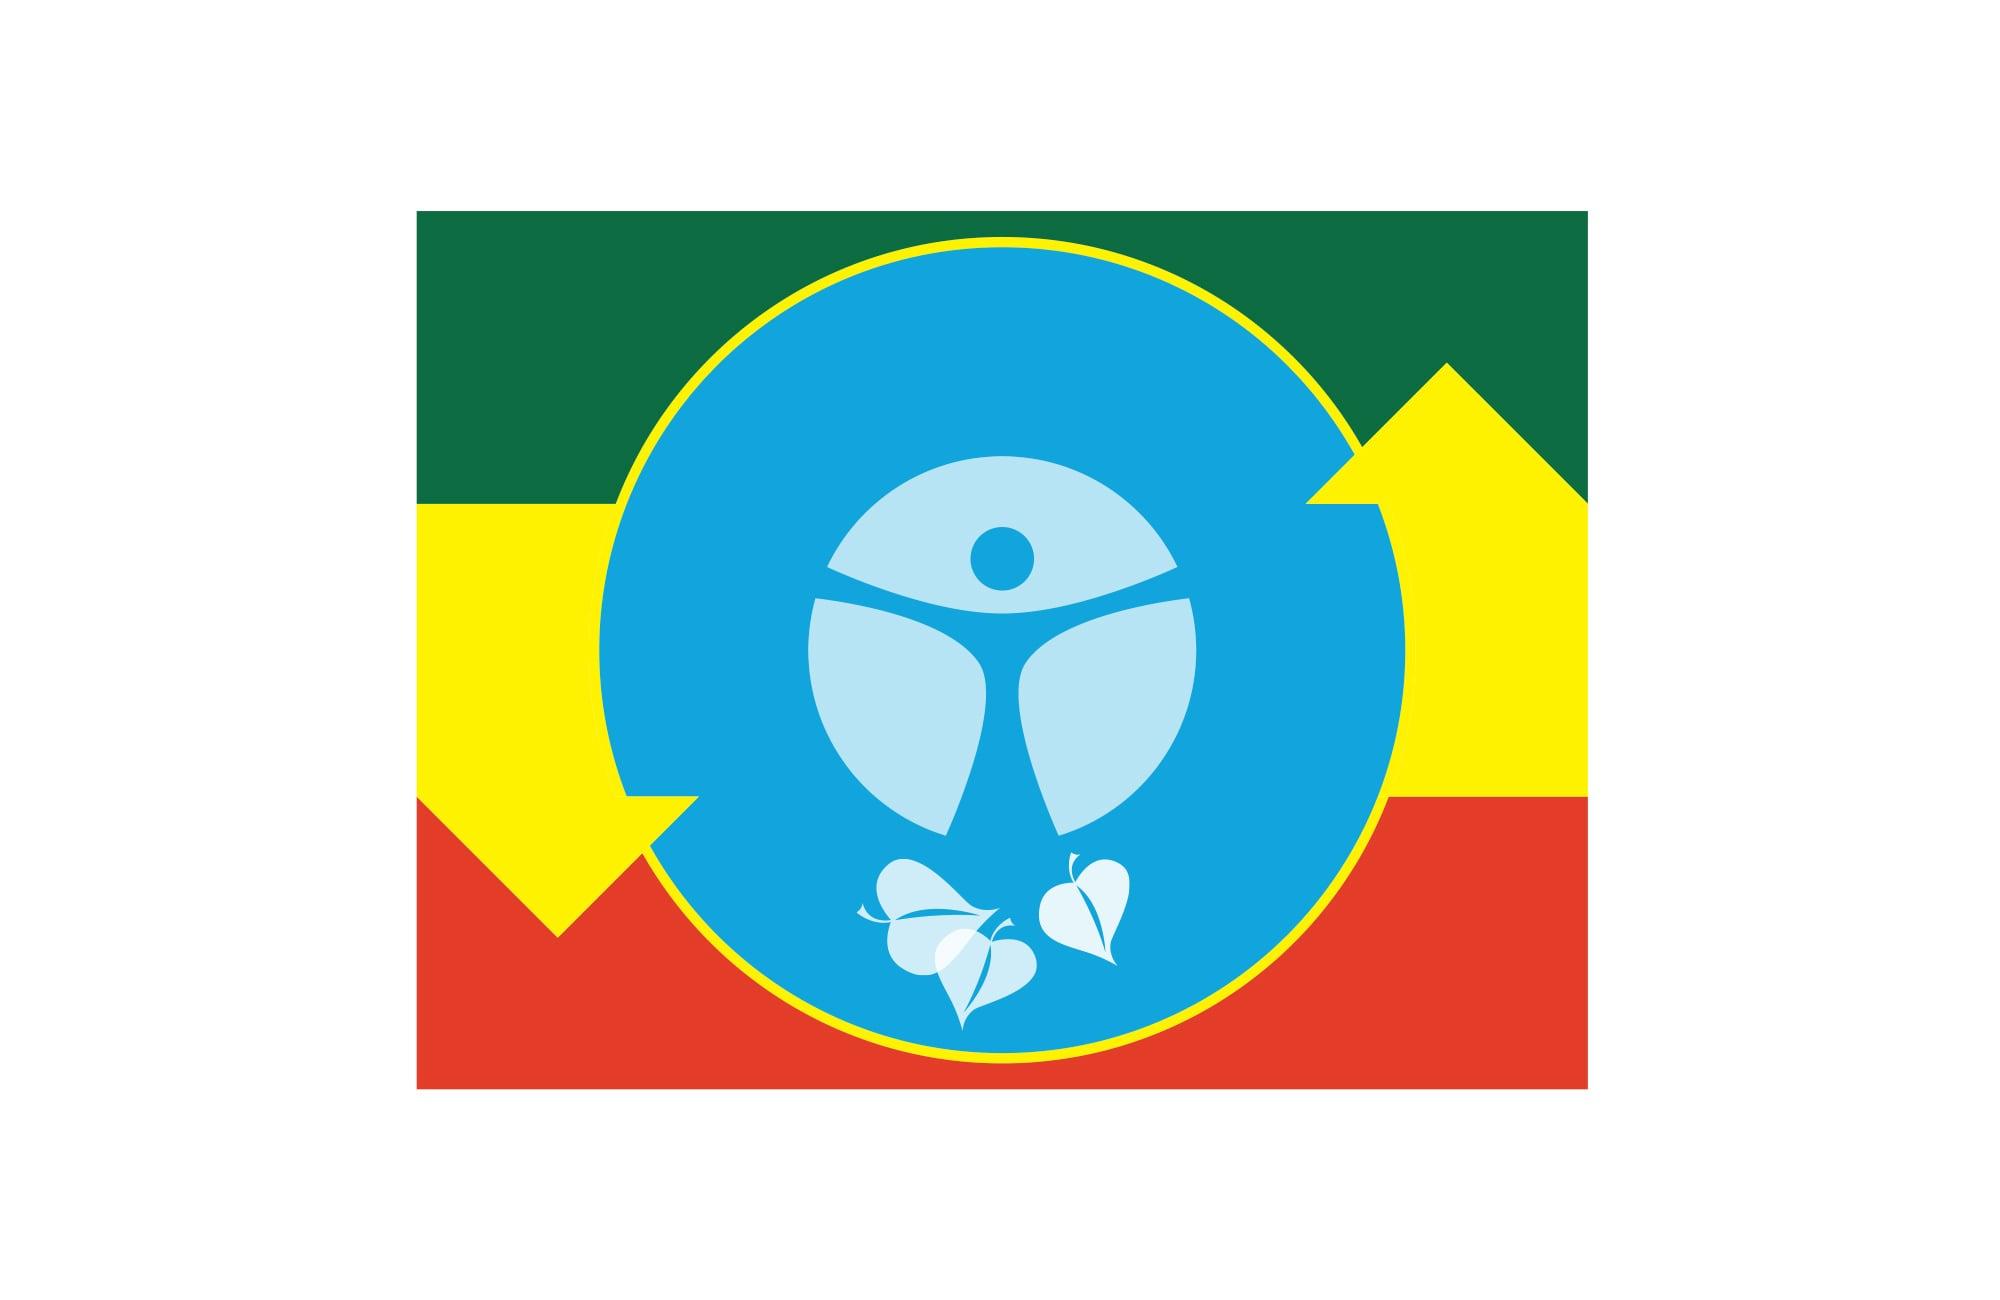 Logo ♦ Neugestaltung